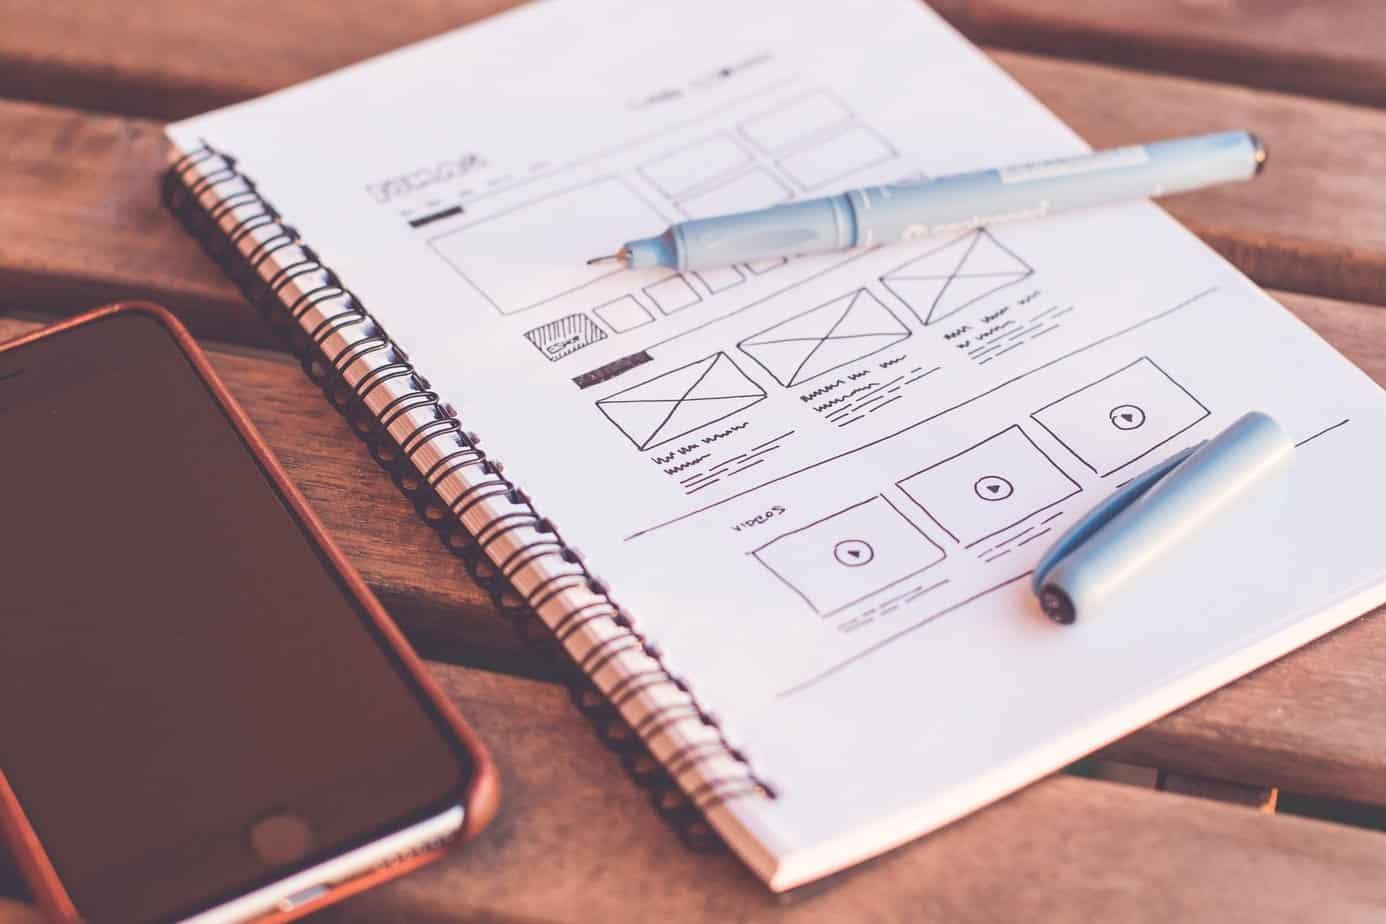 UI Design Rules for Website